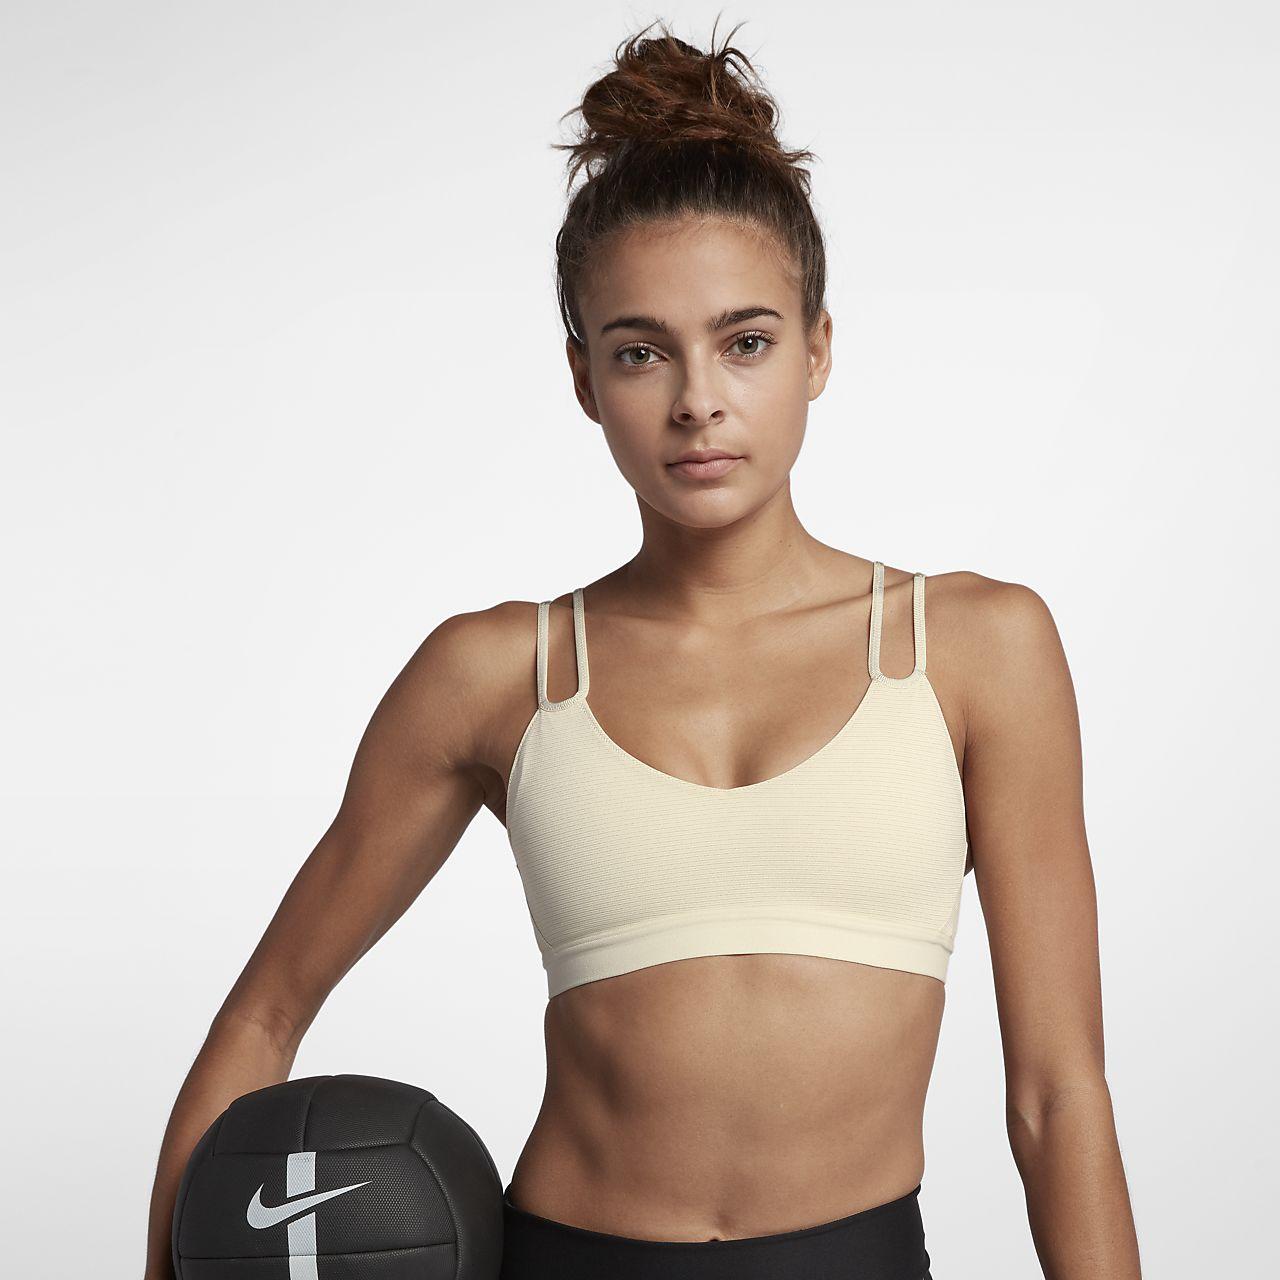 1c920aaf35dc7 Nike Indy Sparkle Women s Light-Support Sports Bra. Nike.com VN